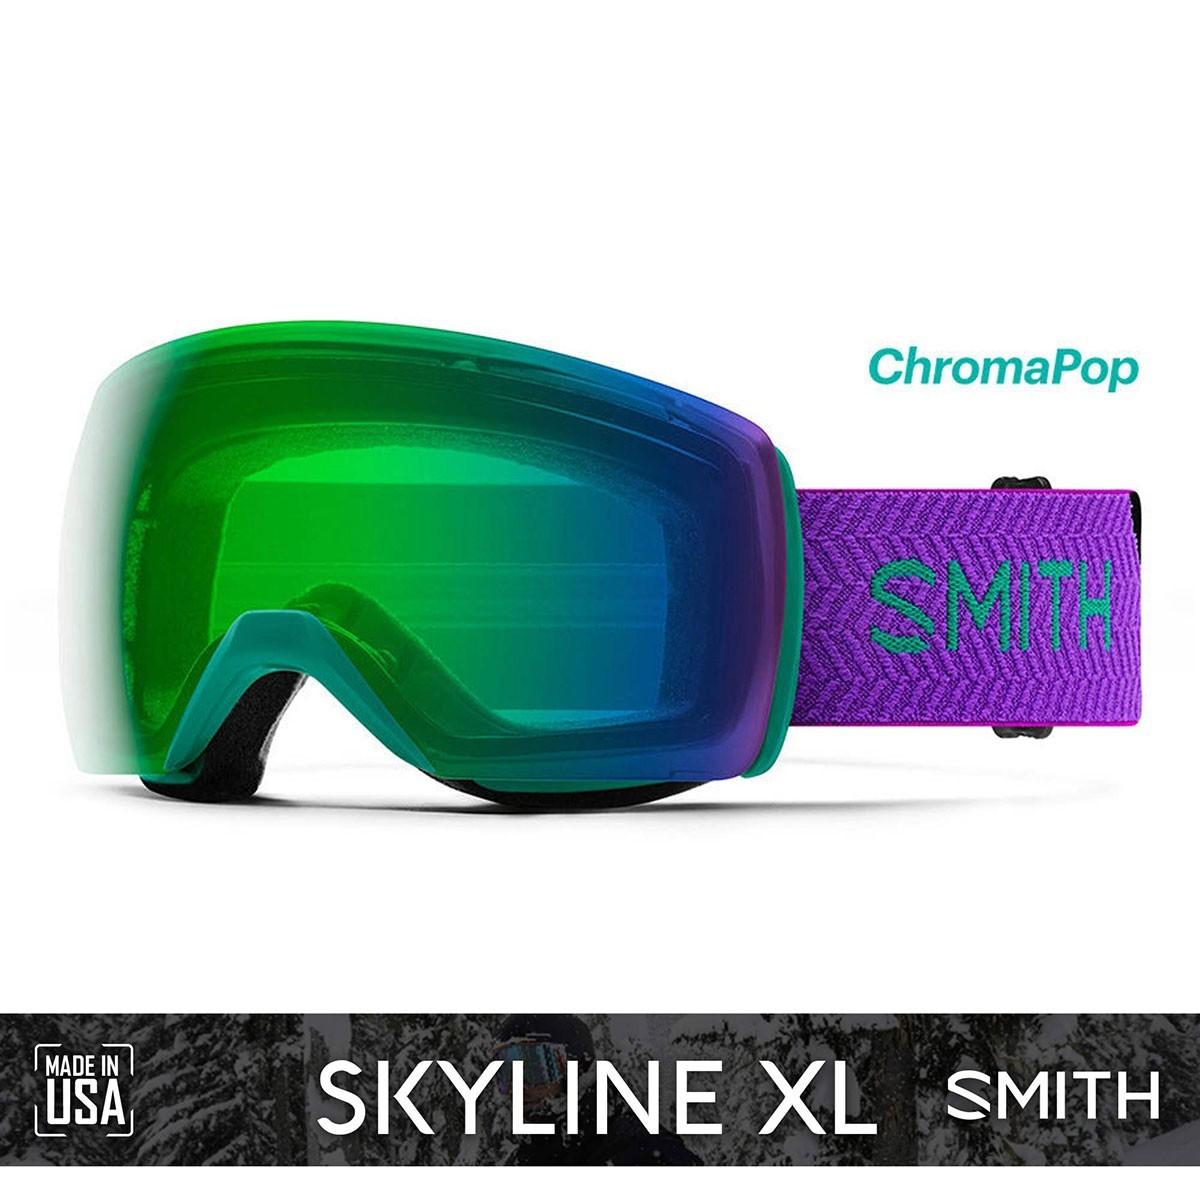 SMITH SKYLINE XL Jade Block | S2 CHROMAPOP Everyday Green Mirror - Изображение - AQUAMATRIX